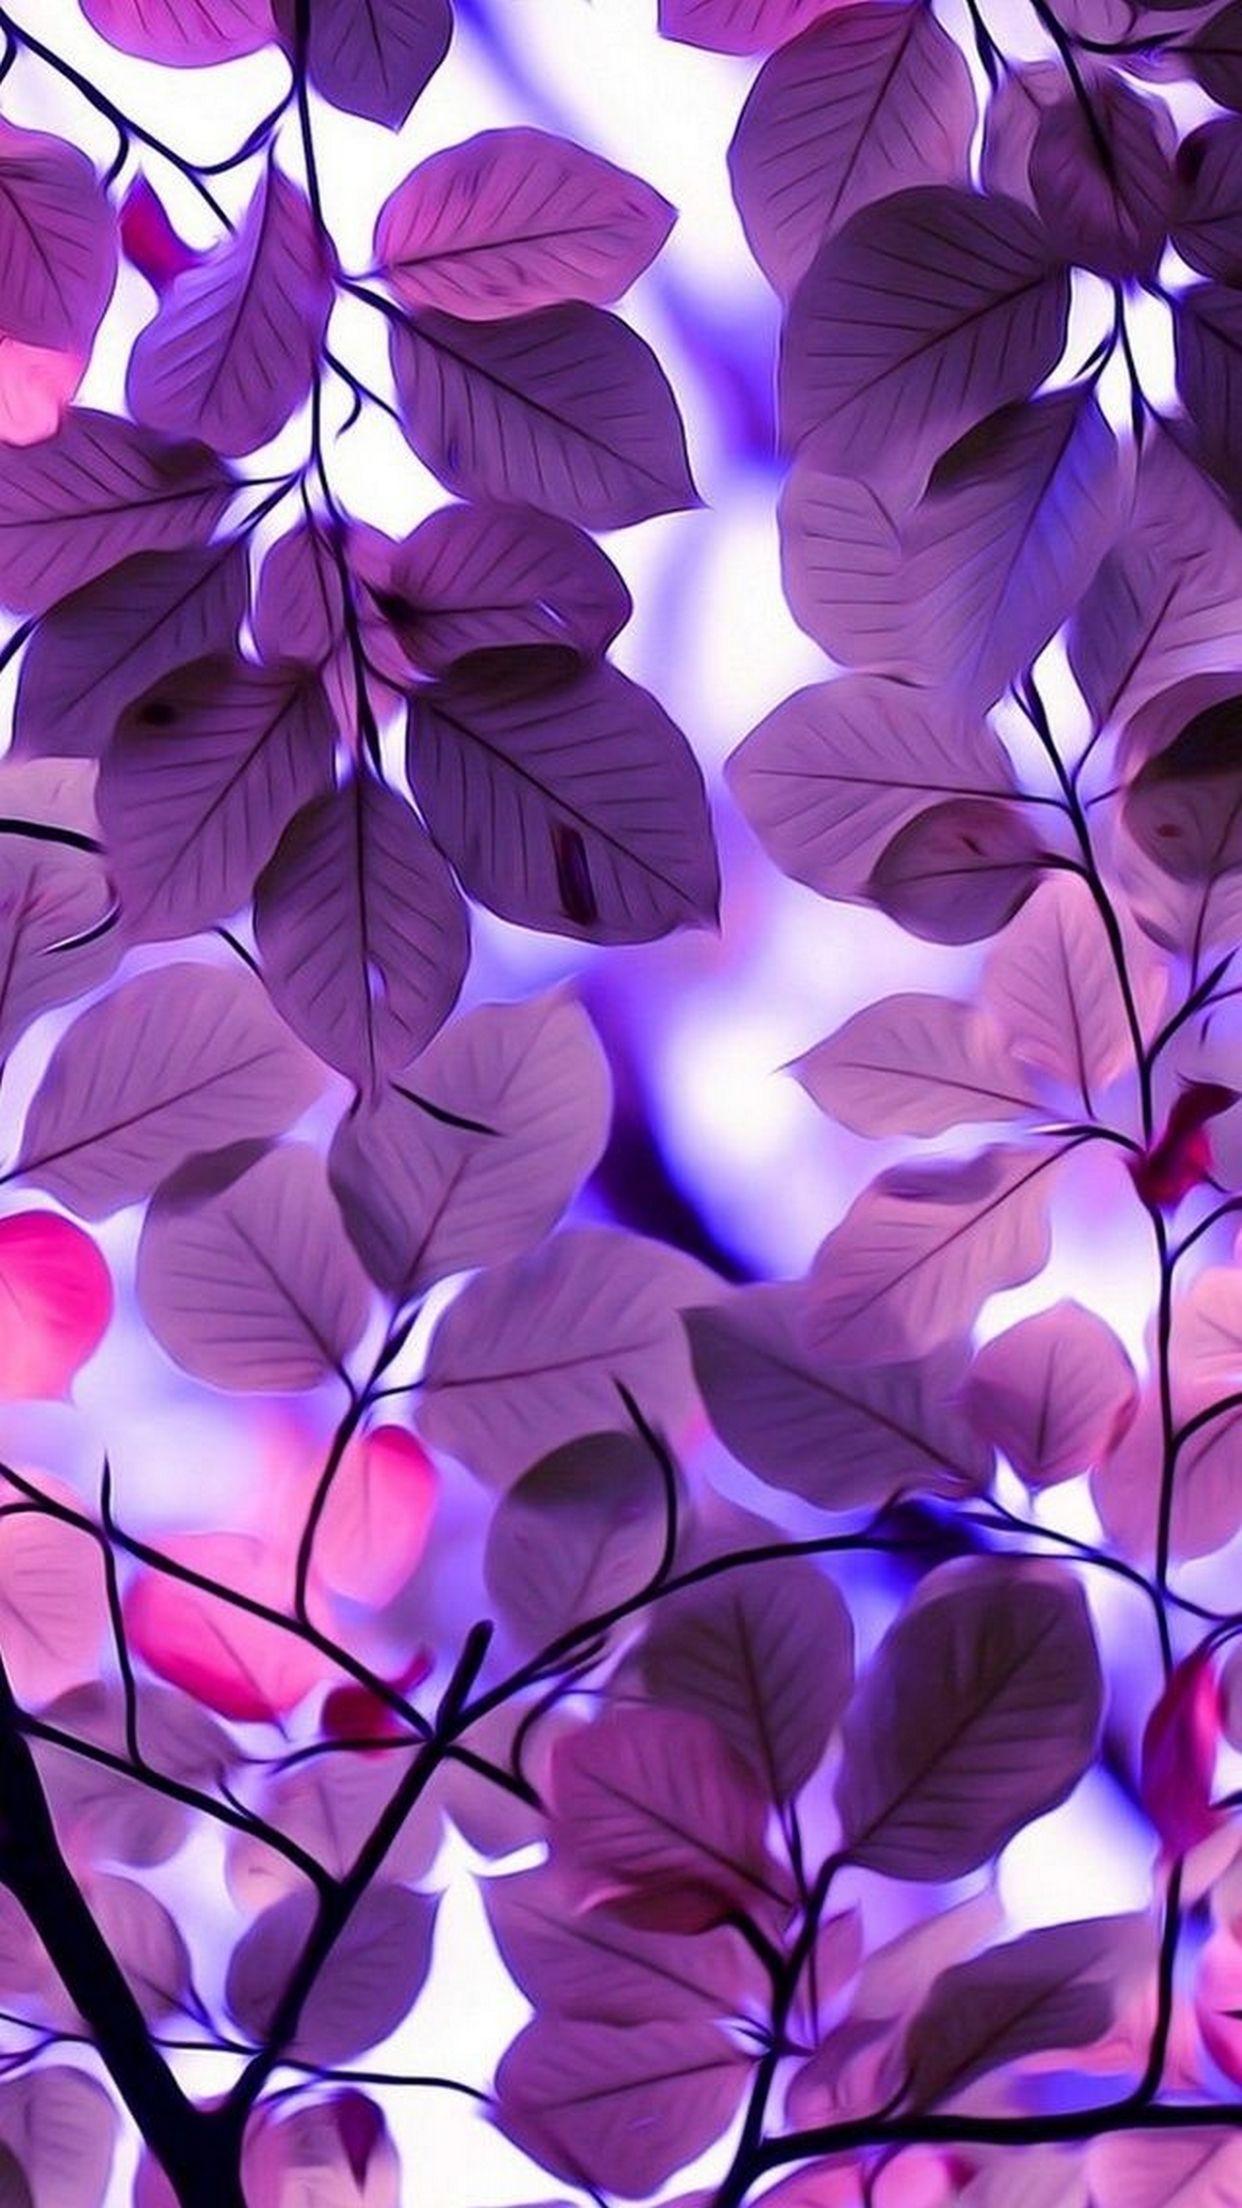 Beautiful Iphone Wallpapers Top Free Beautiful Iphone Backgrounds Wallpaperaccess